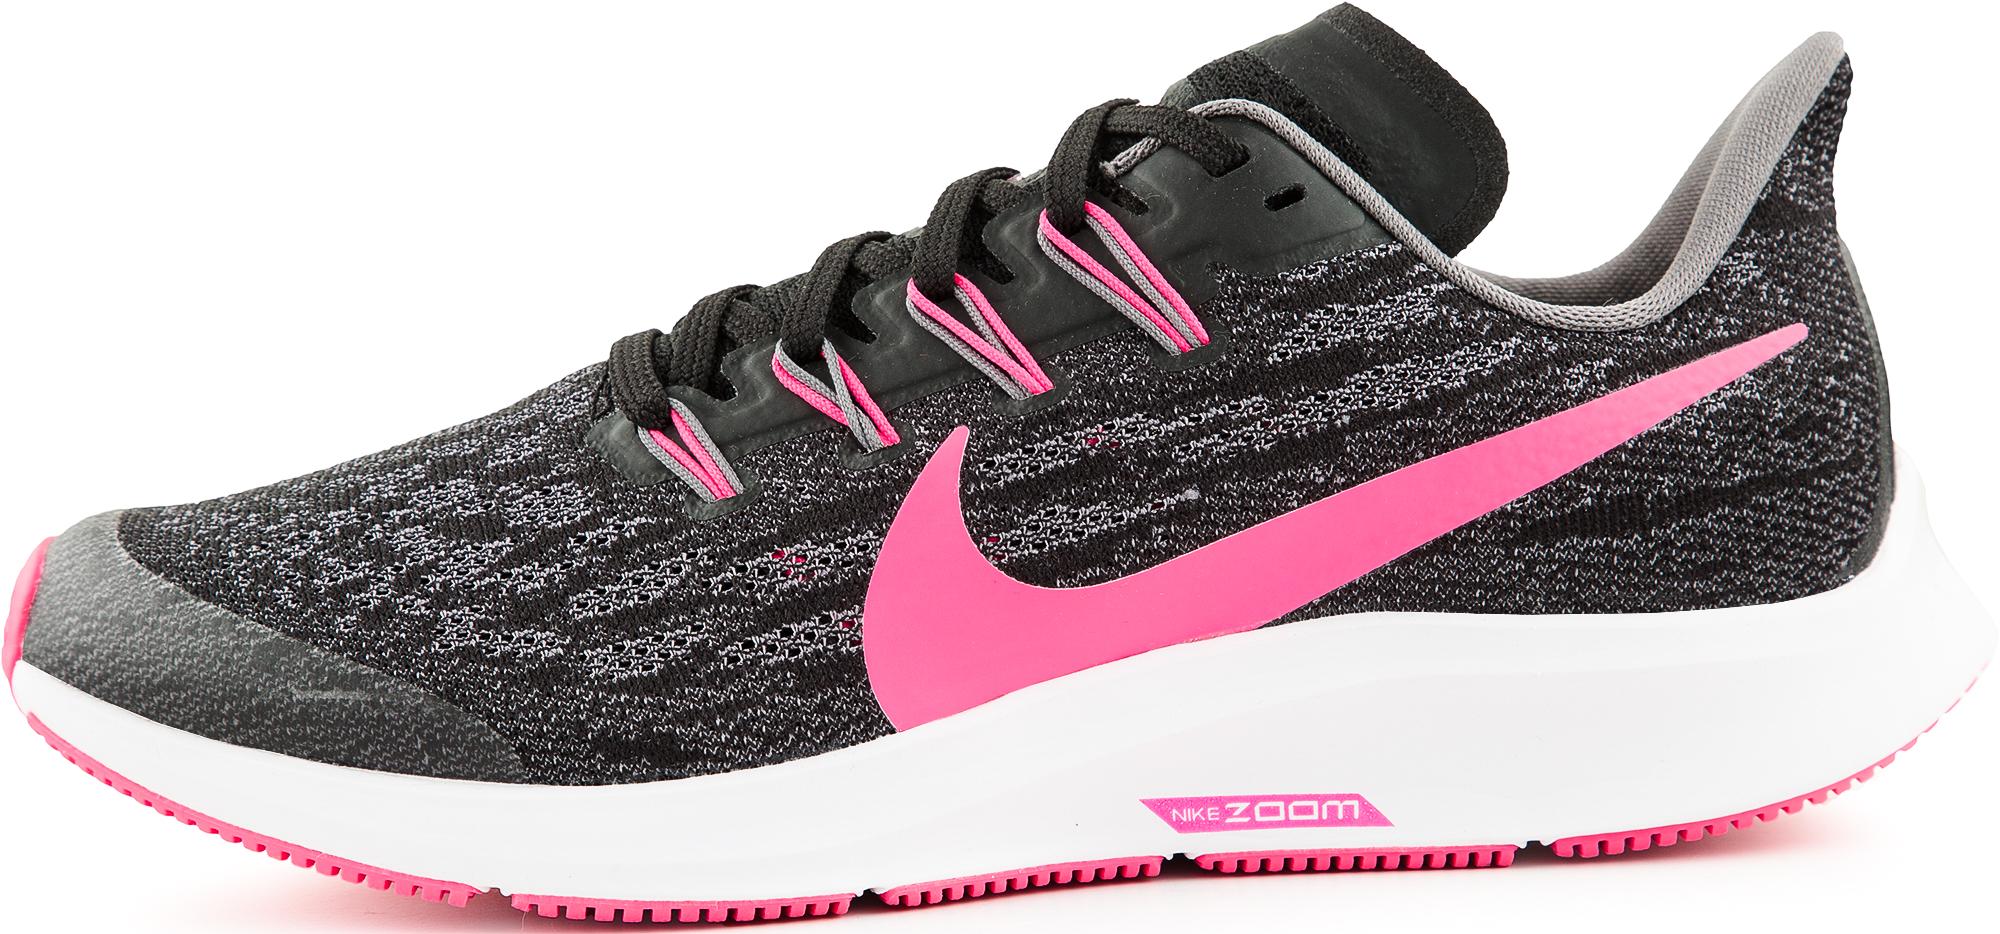 Nike Кроссовки для девочек Air Zoom Pegasus 36, размер 35